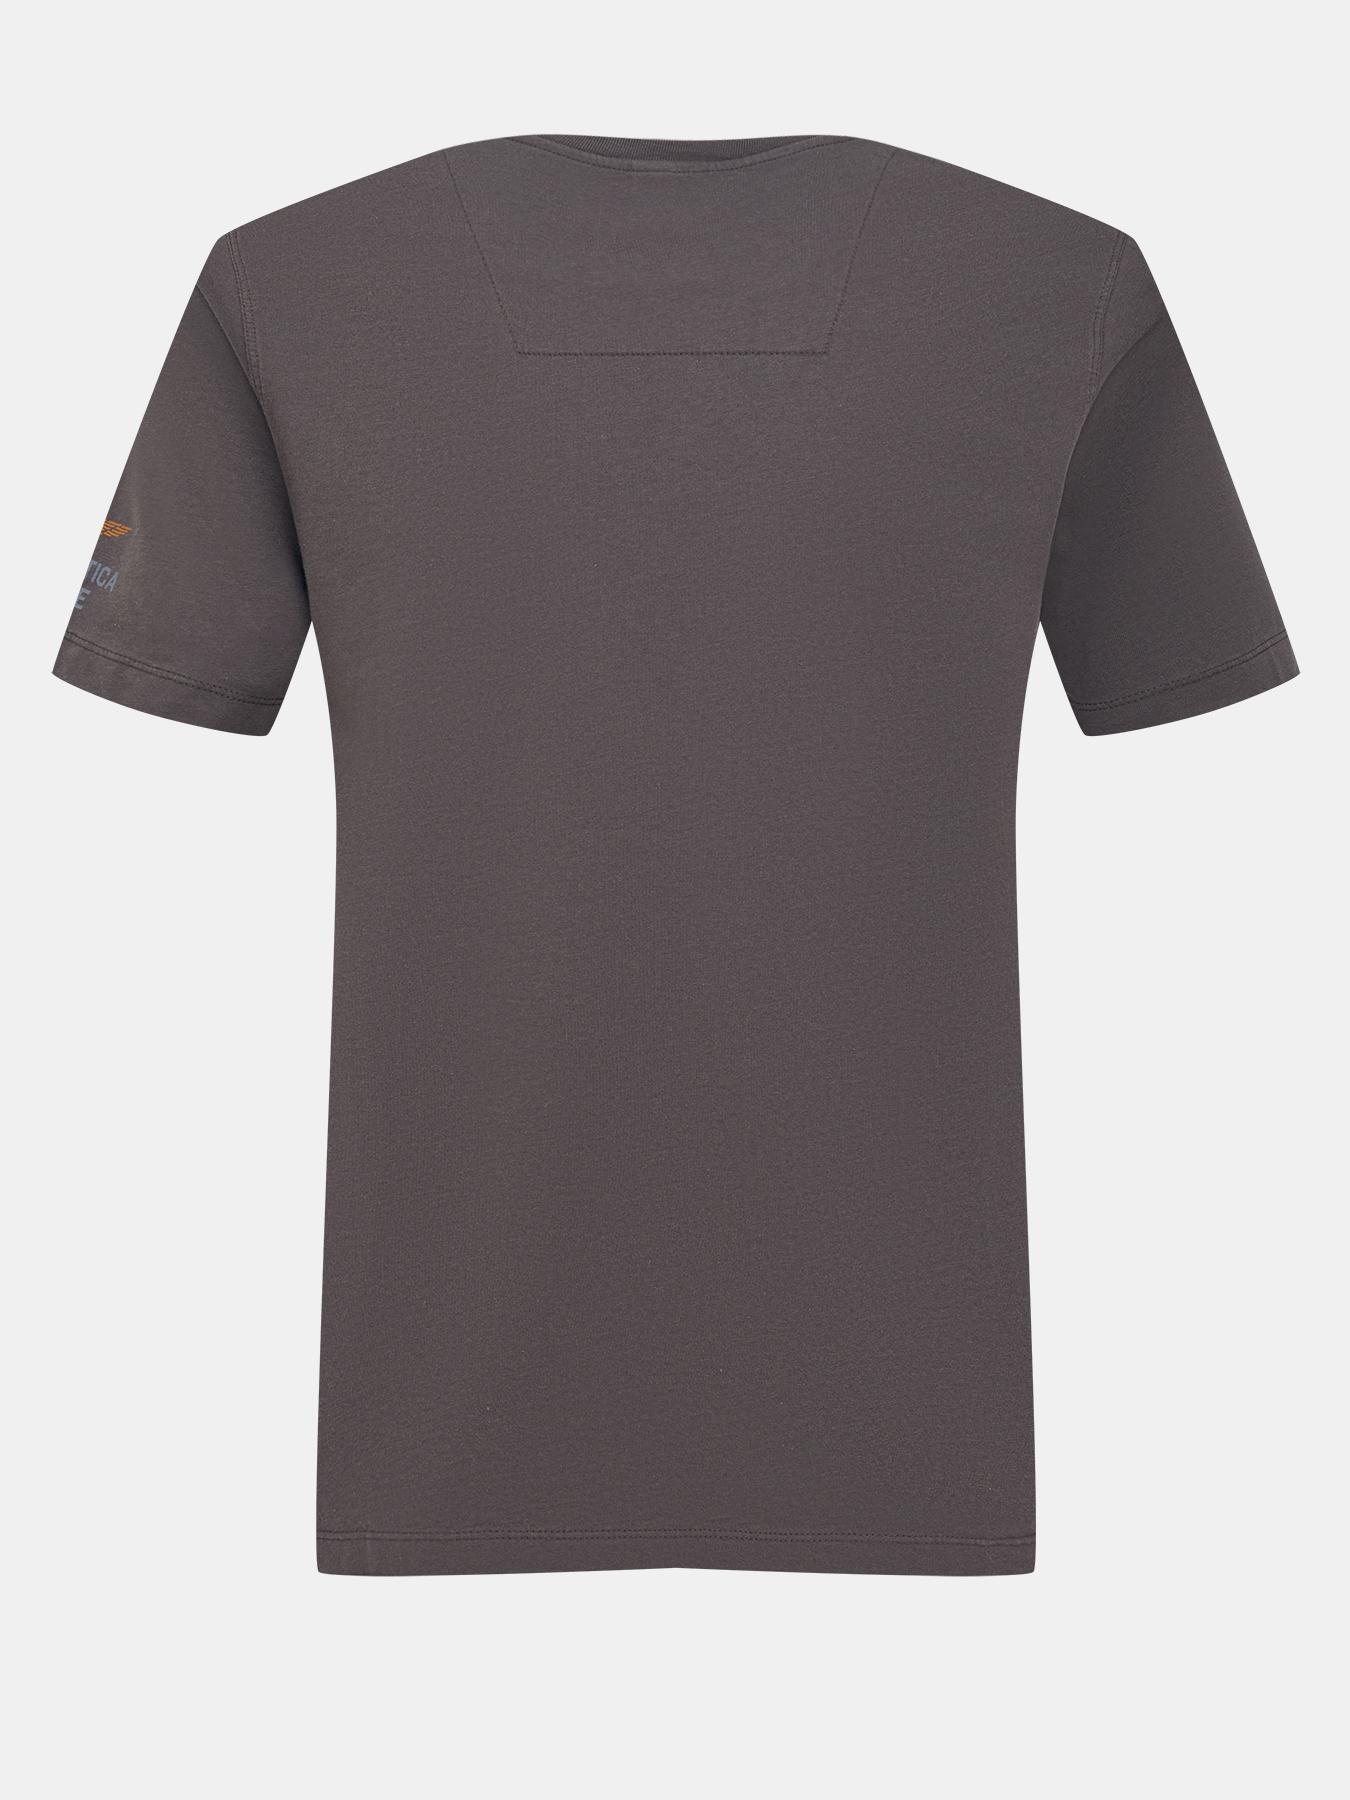 Фуфайка (футболка) Aeronautica Militare Футболка